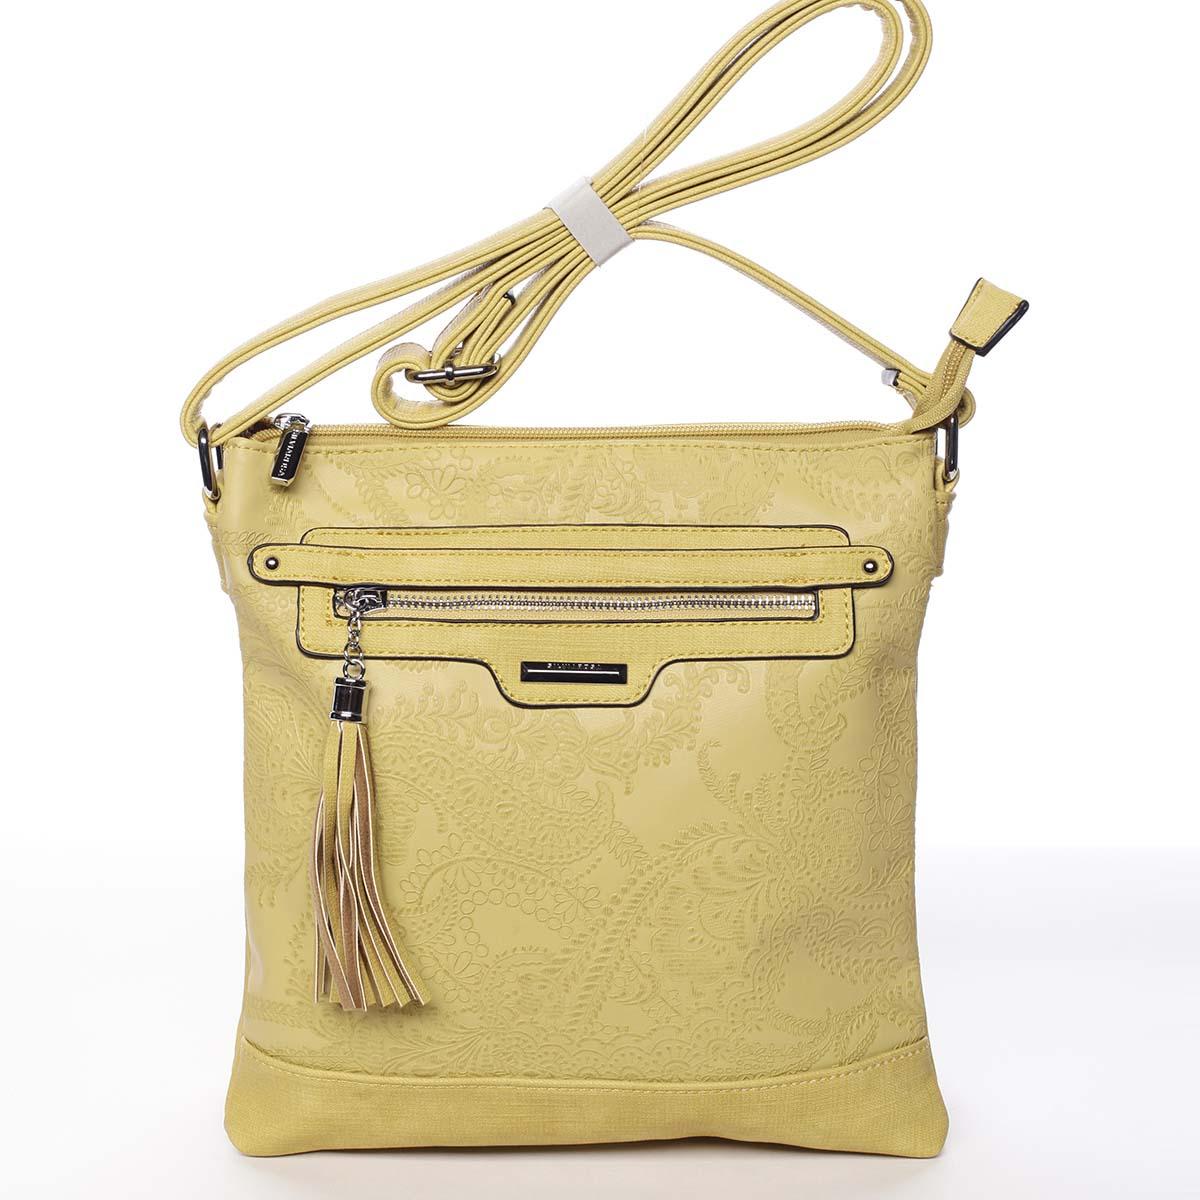 Módní dámská žlutá crossbody kabelka se vzorem - Silvia Rosa Gillian